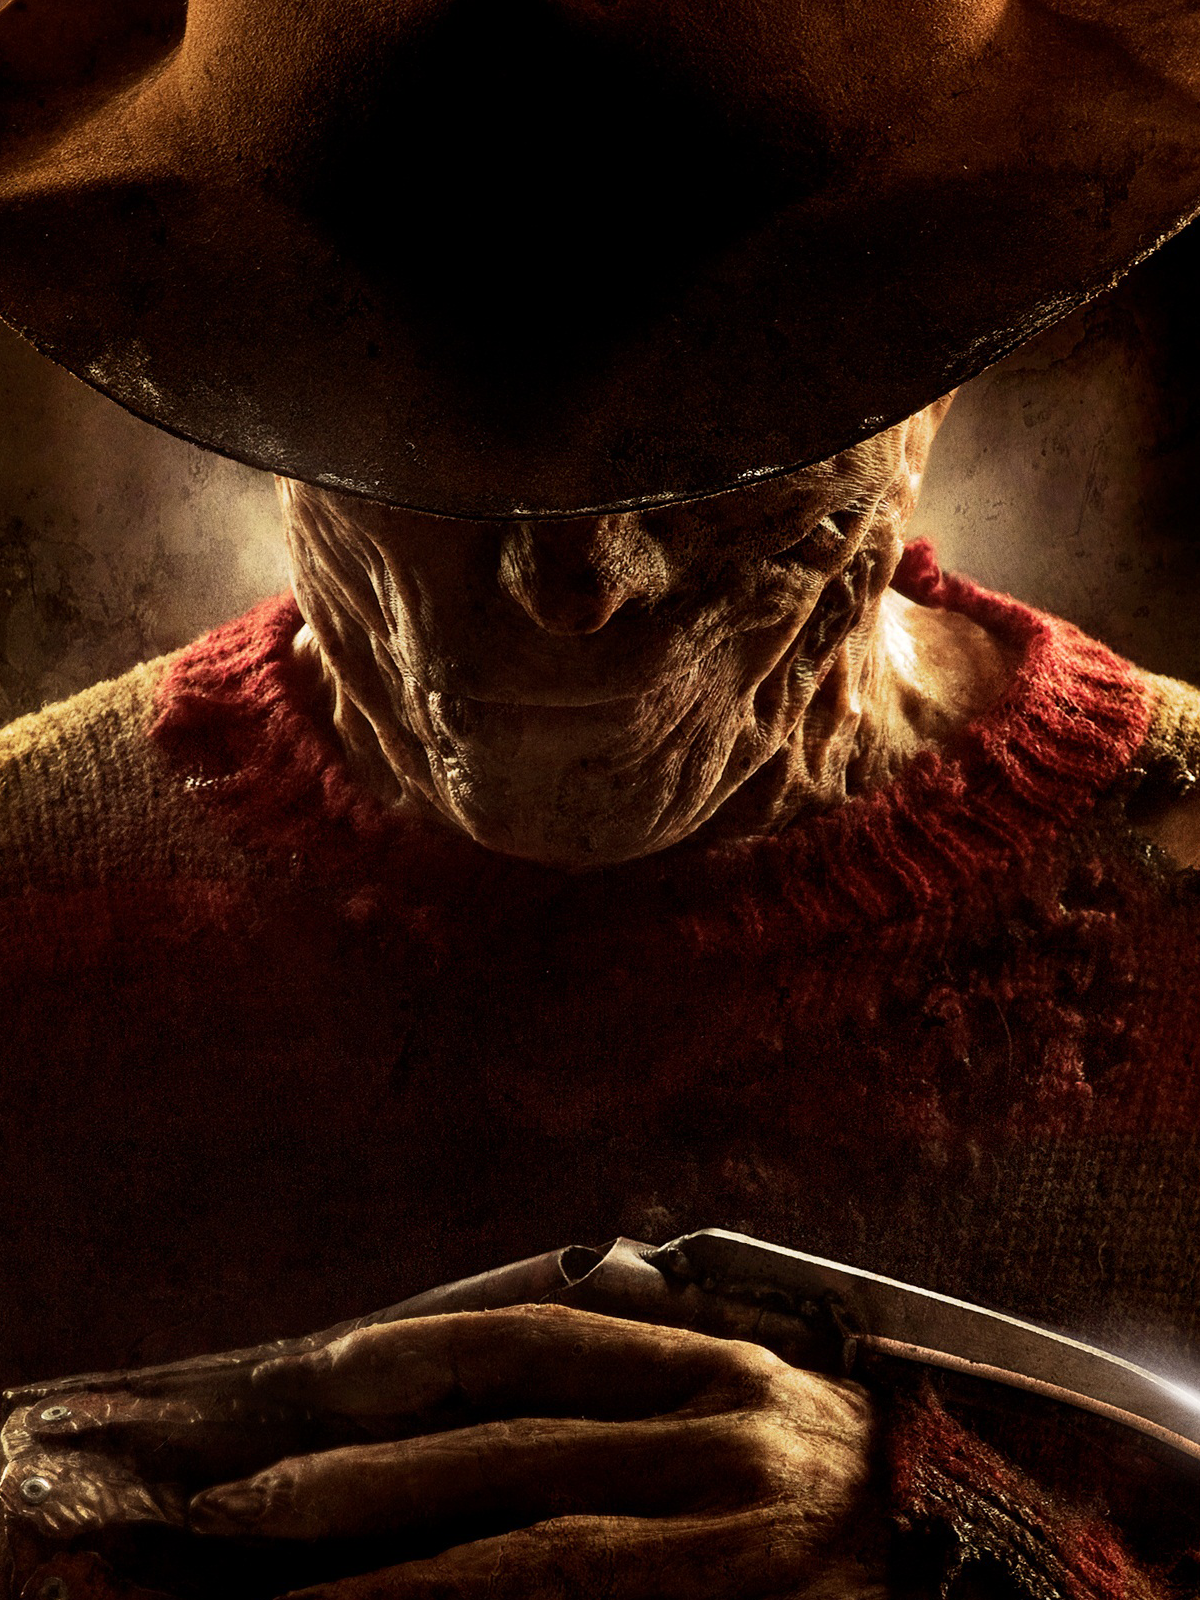 Freddy Krueger Hd Wallpapers Desktop Wallpapers Cartazes De Filmes De Terror A Hora Do Pesadelo Filmes De Terror